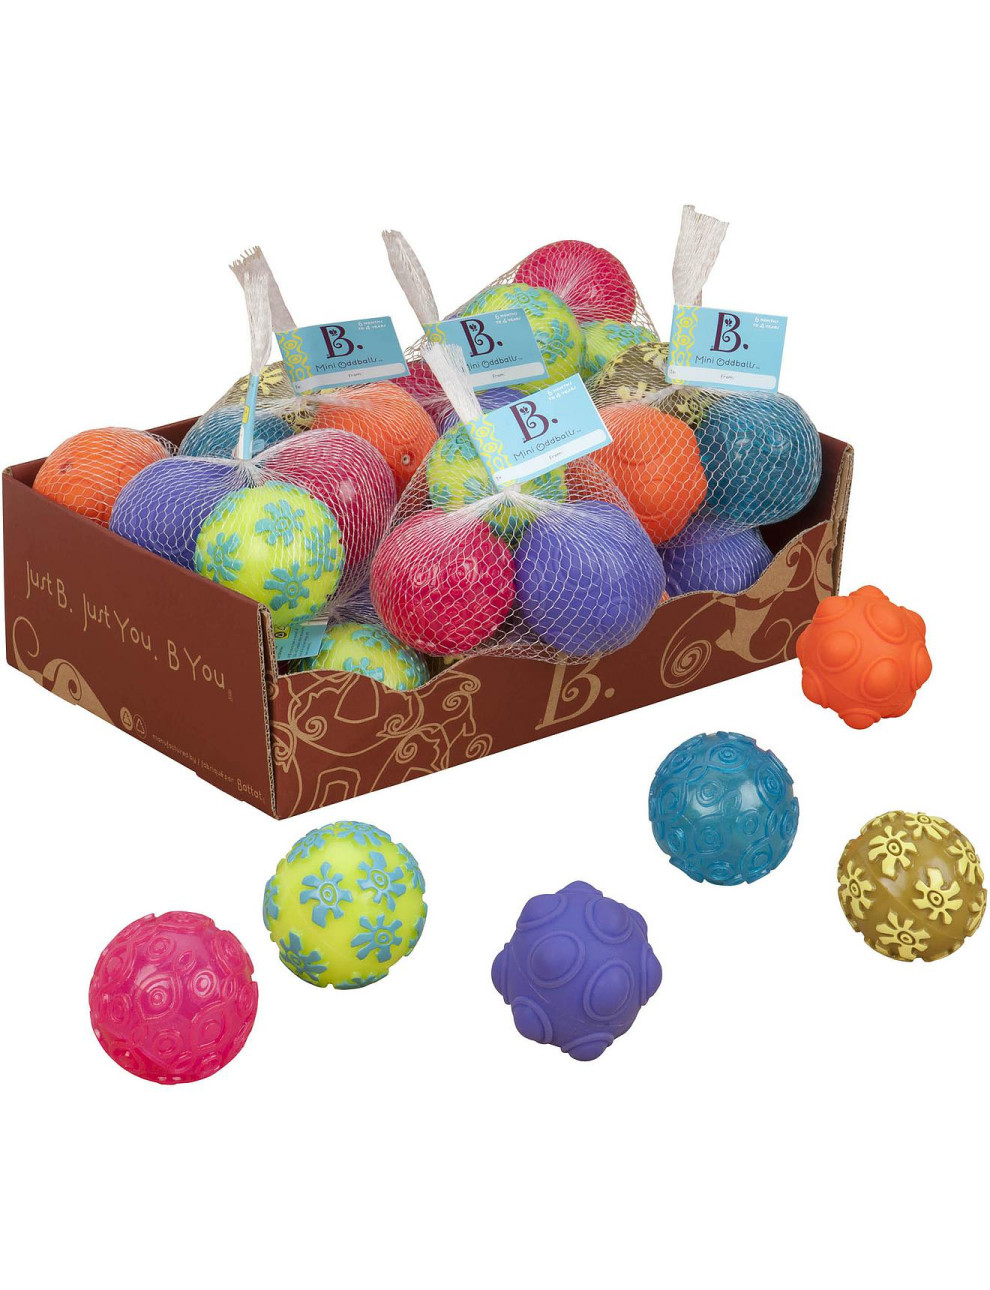 Mini kamuoliukai B-TOYS Oddballs 6 mėn.-4 m. vaikams, 3 vnt. (BX1301Z)